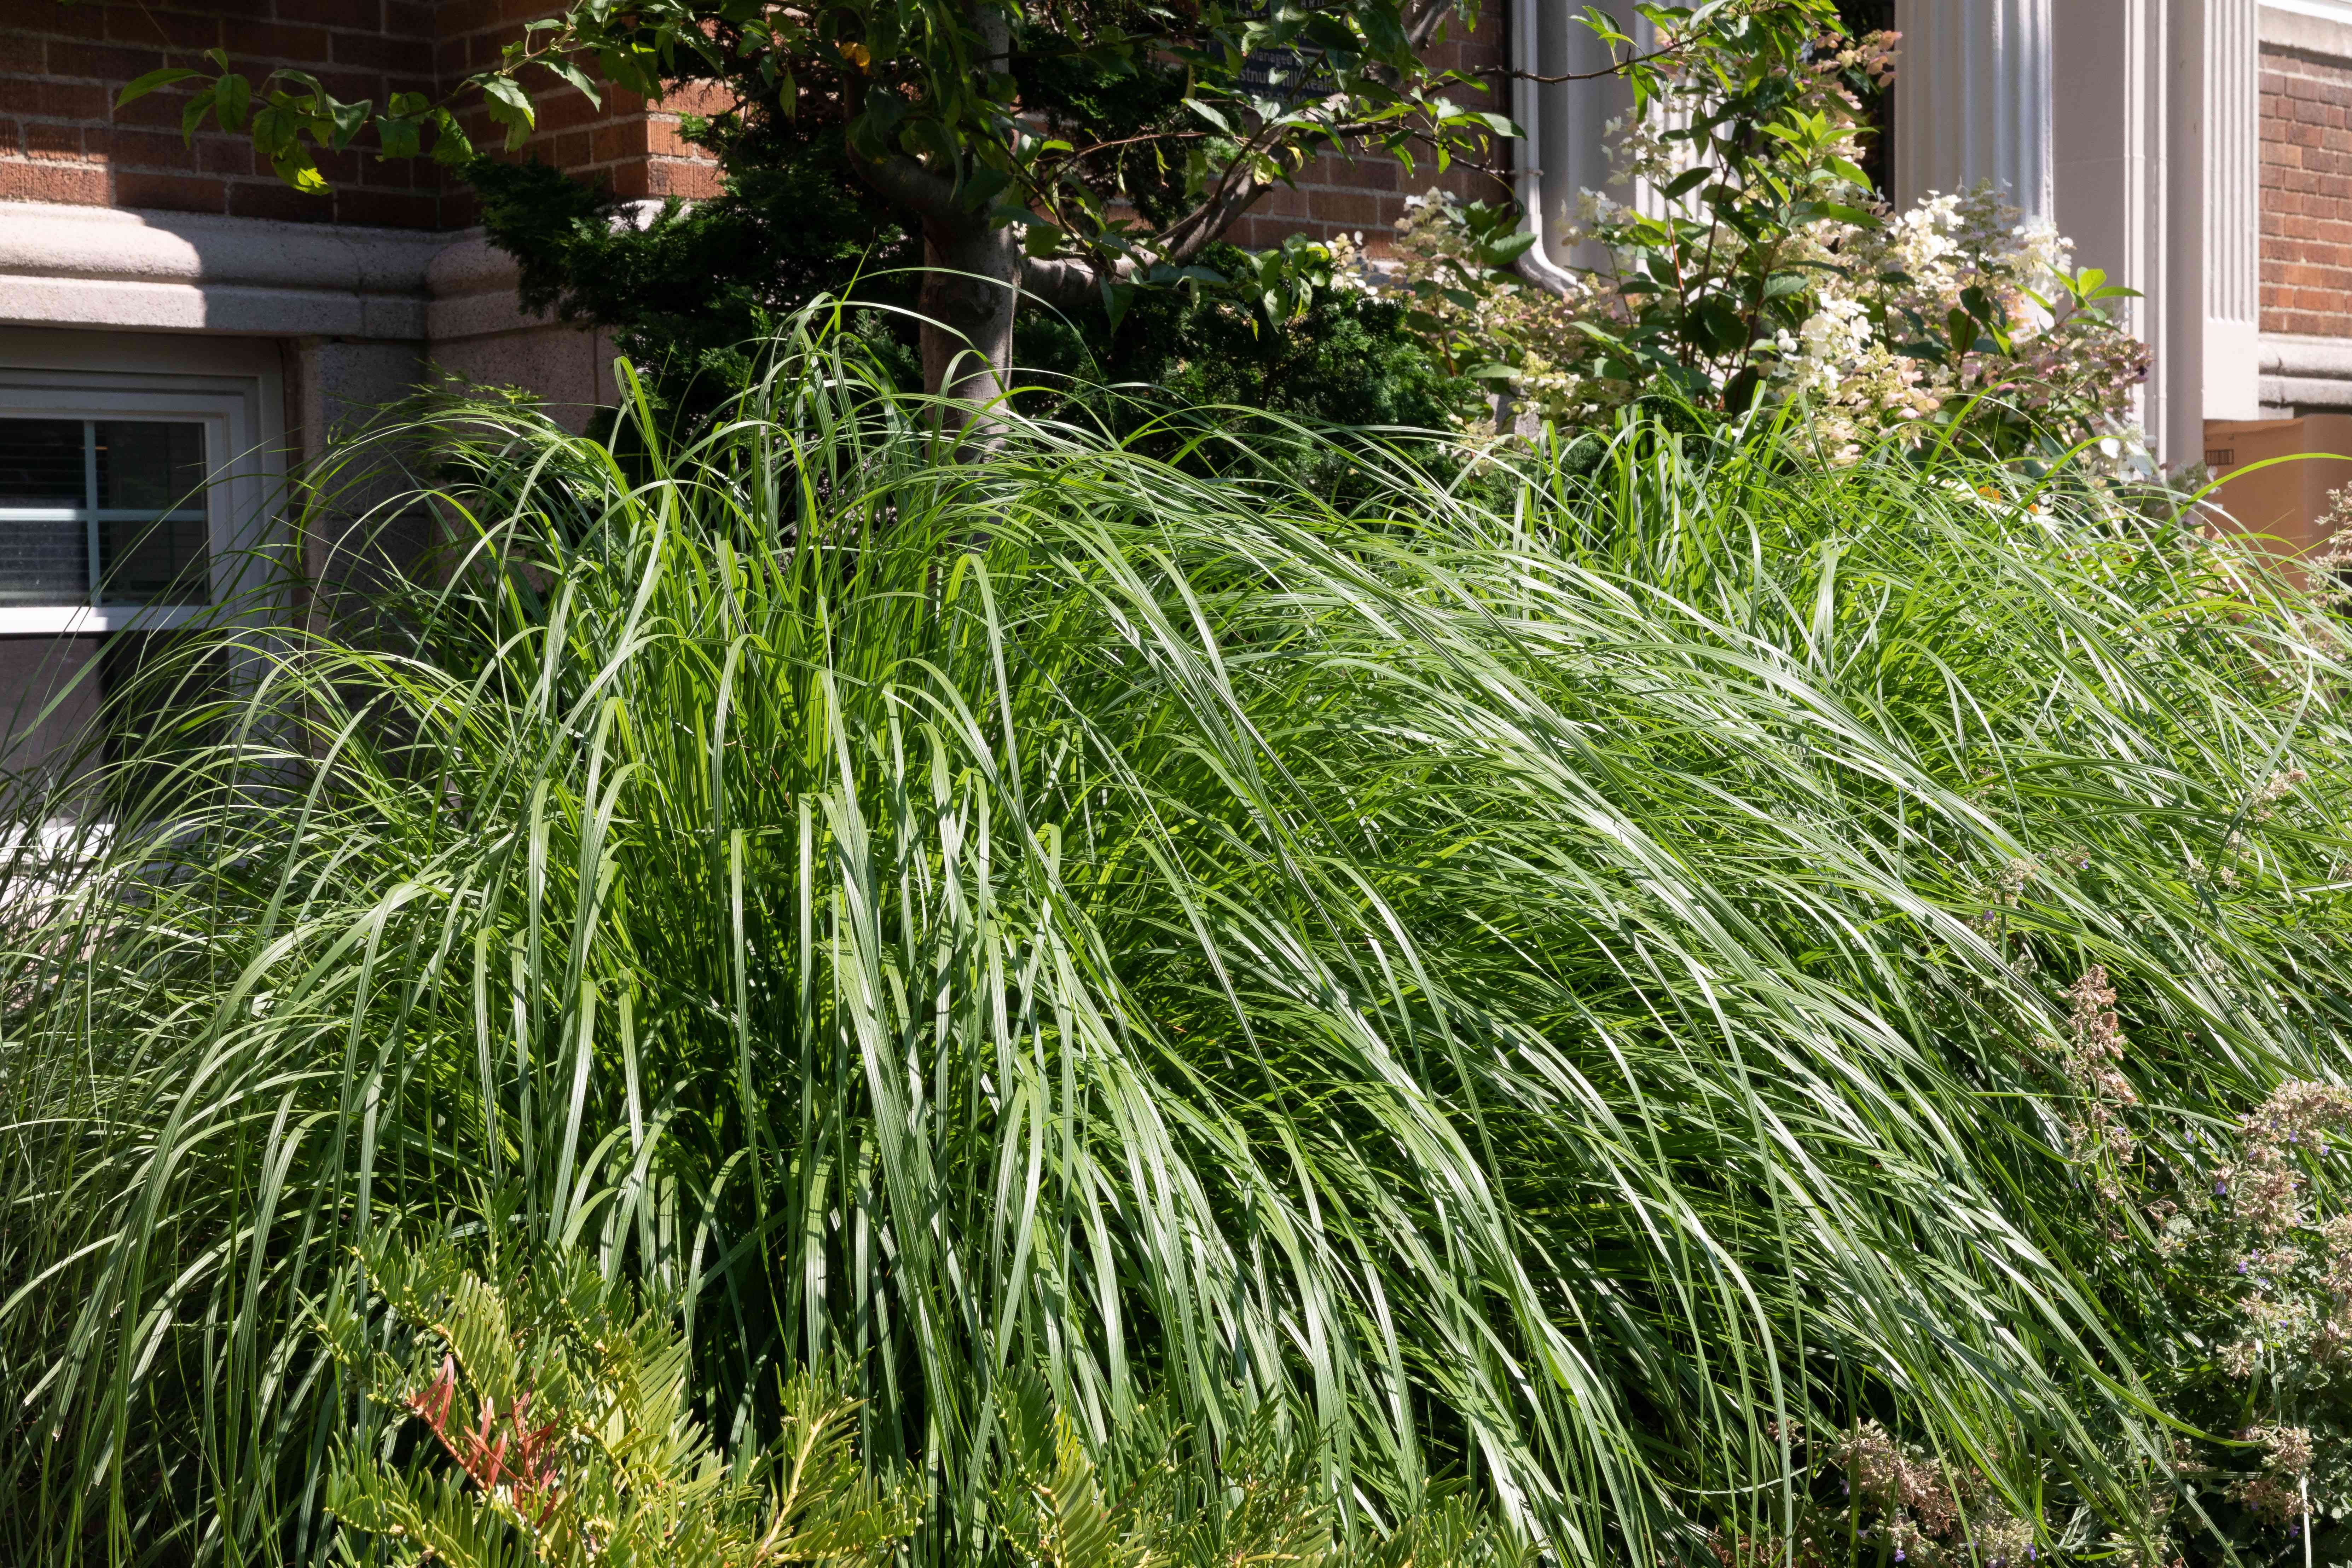 lemongrass as part of a landscape design